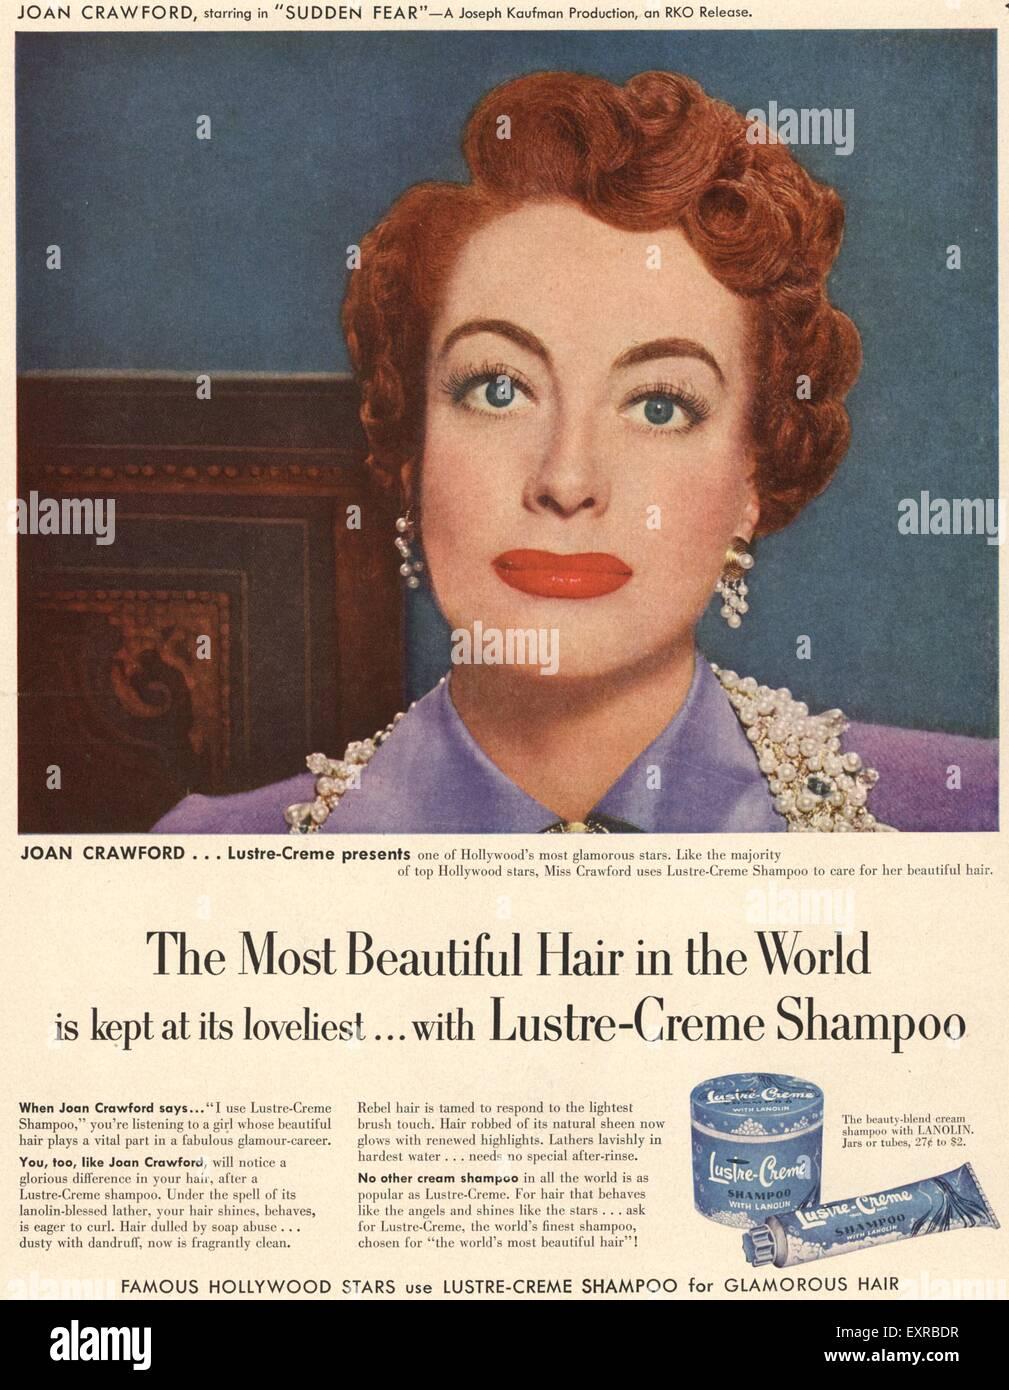 1950s USA Lustre-Creme Magazine Advert - Stock Image